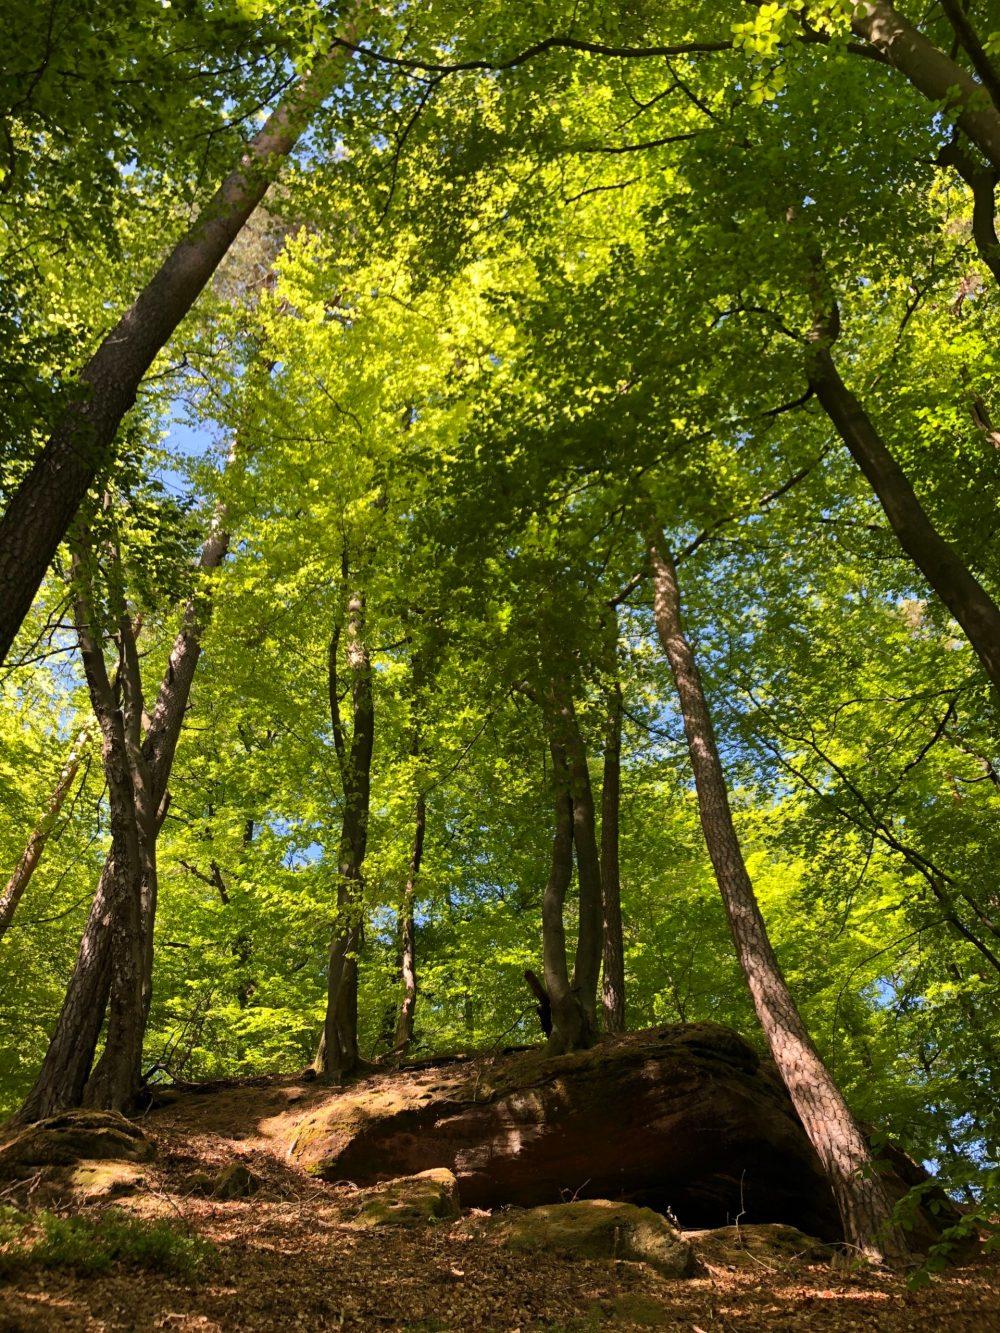 Felsen unter strahlend grünen Baumkronen